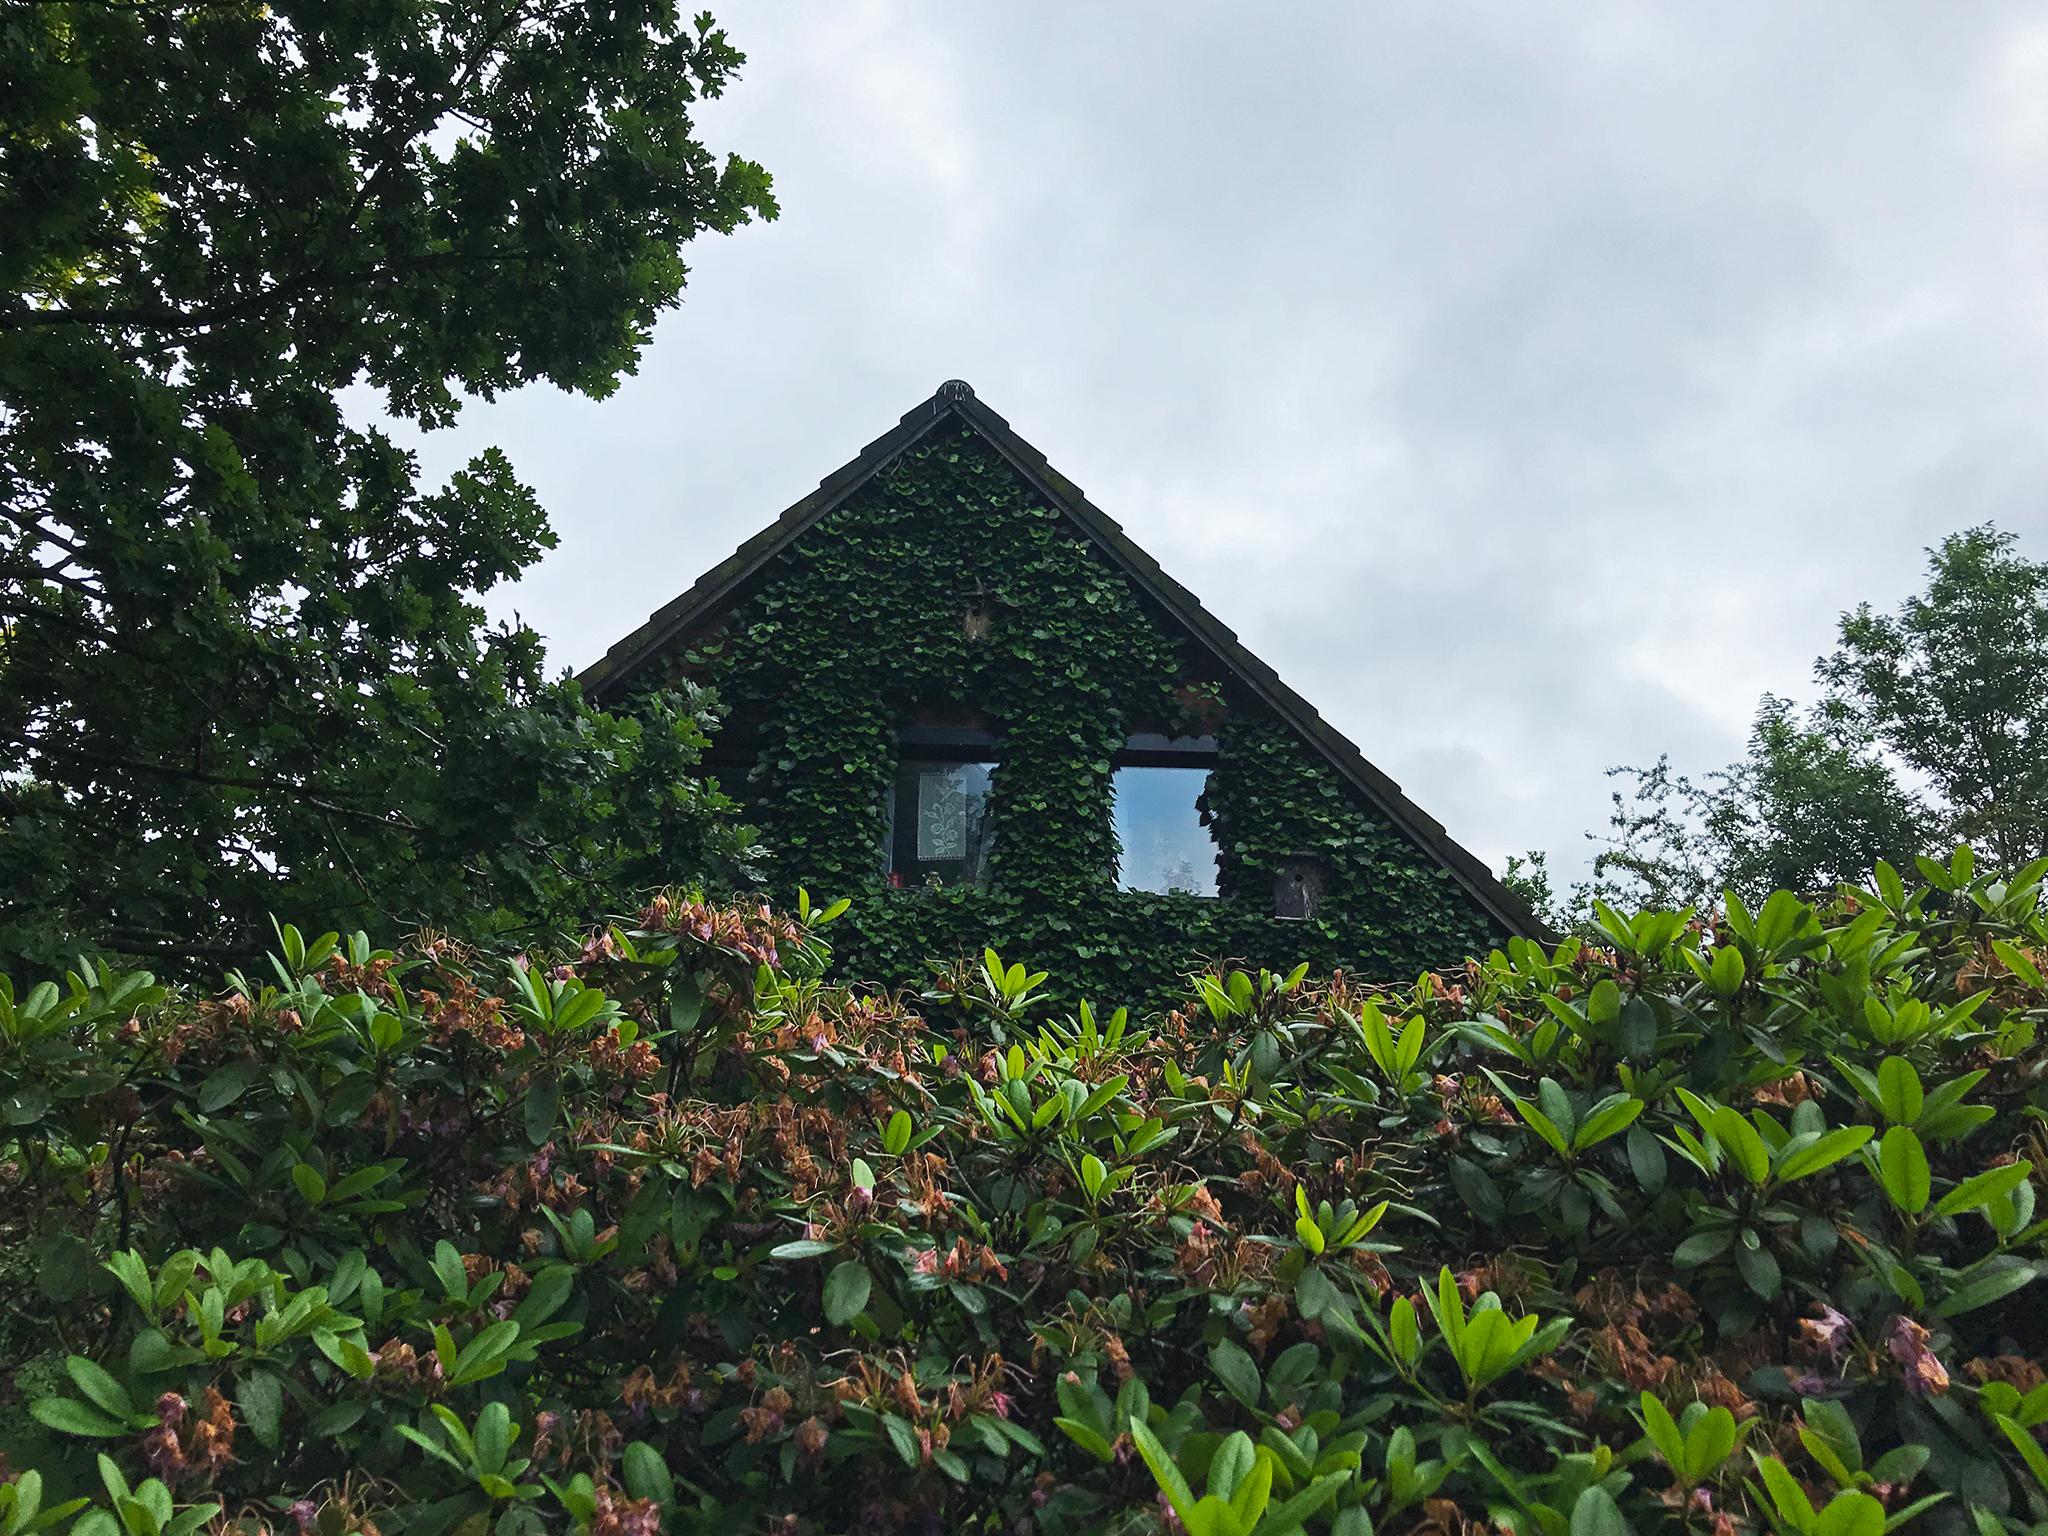 Overgrown house in Struckum